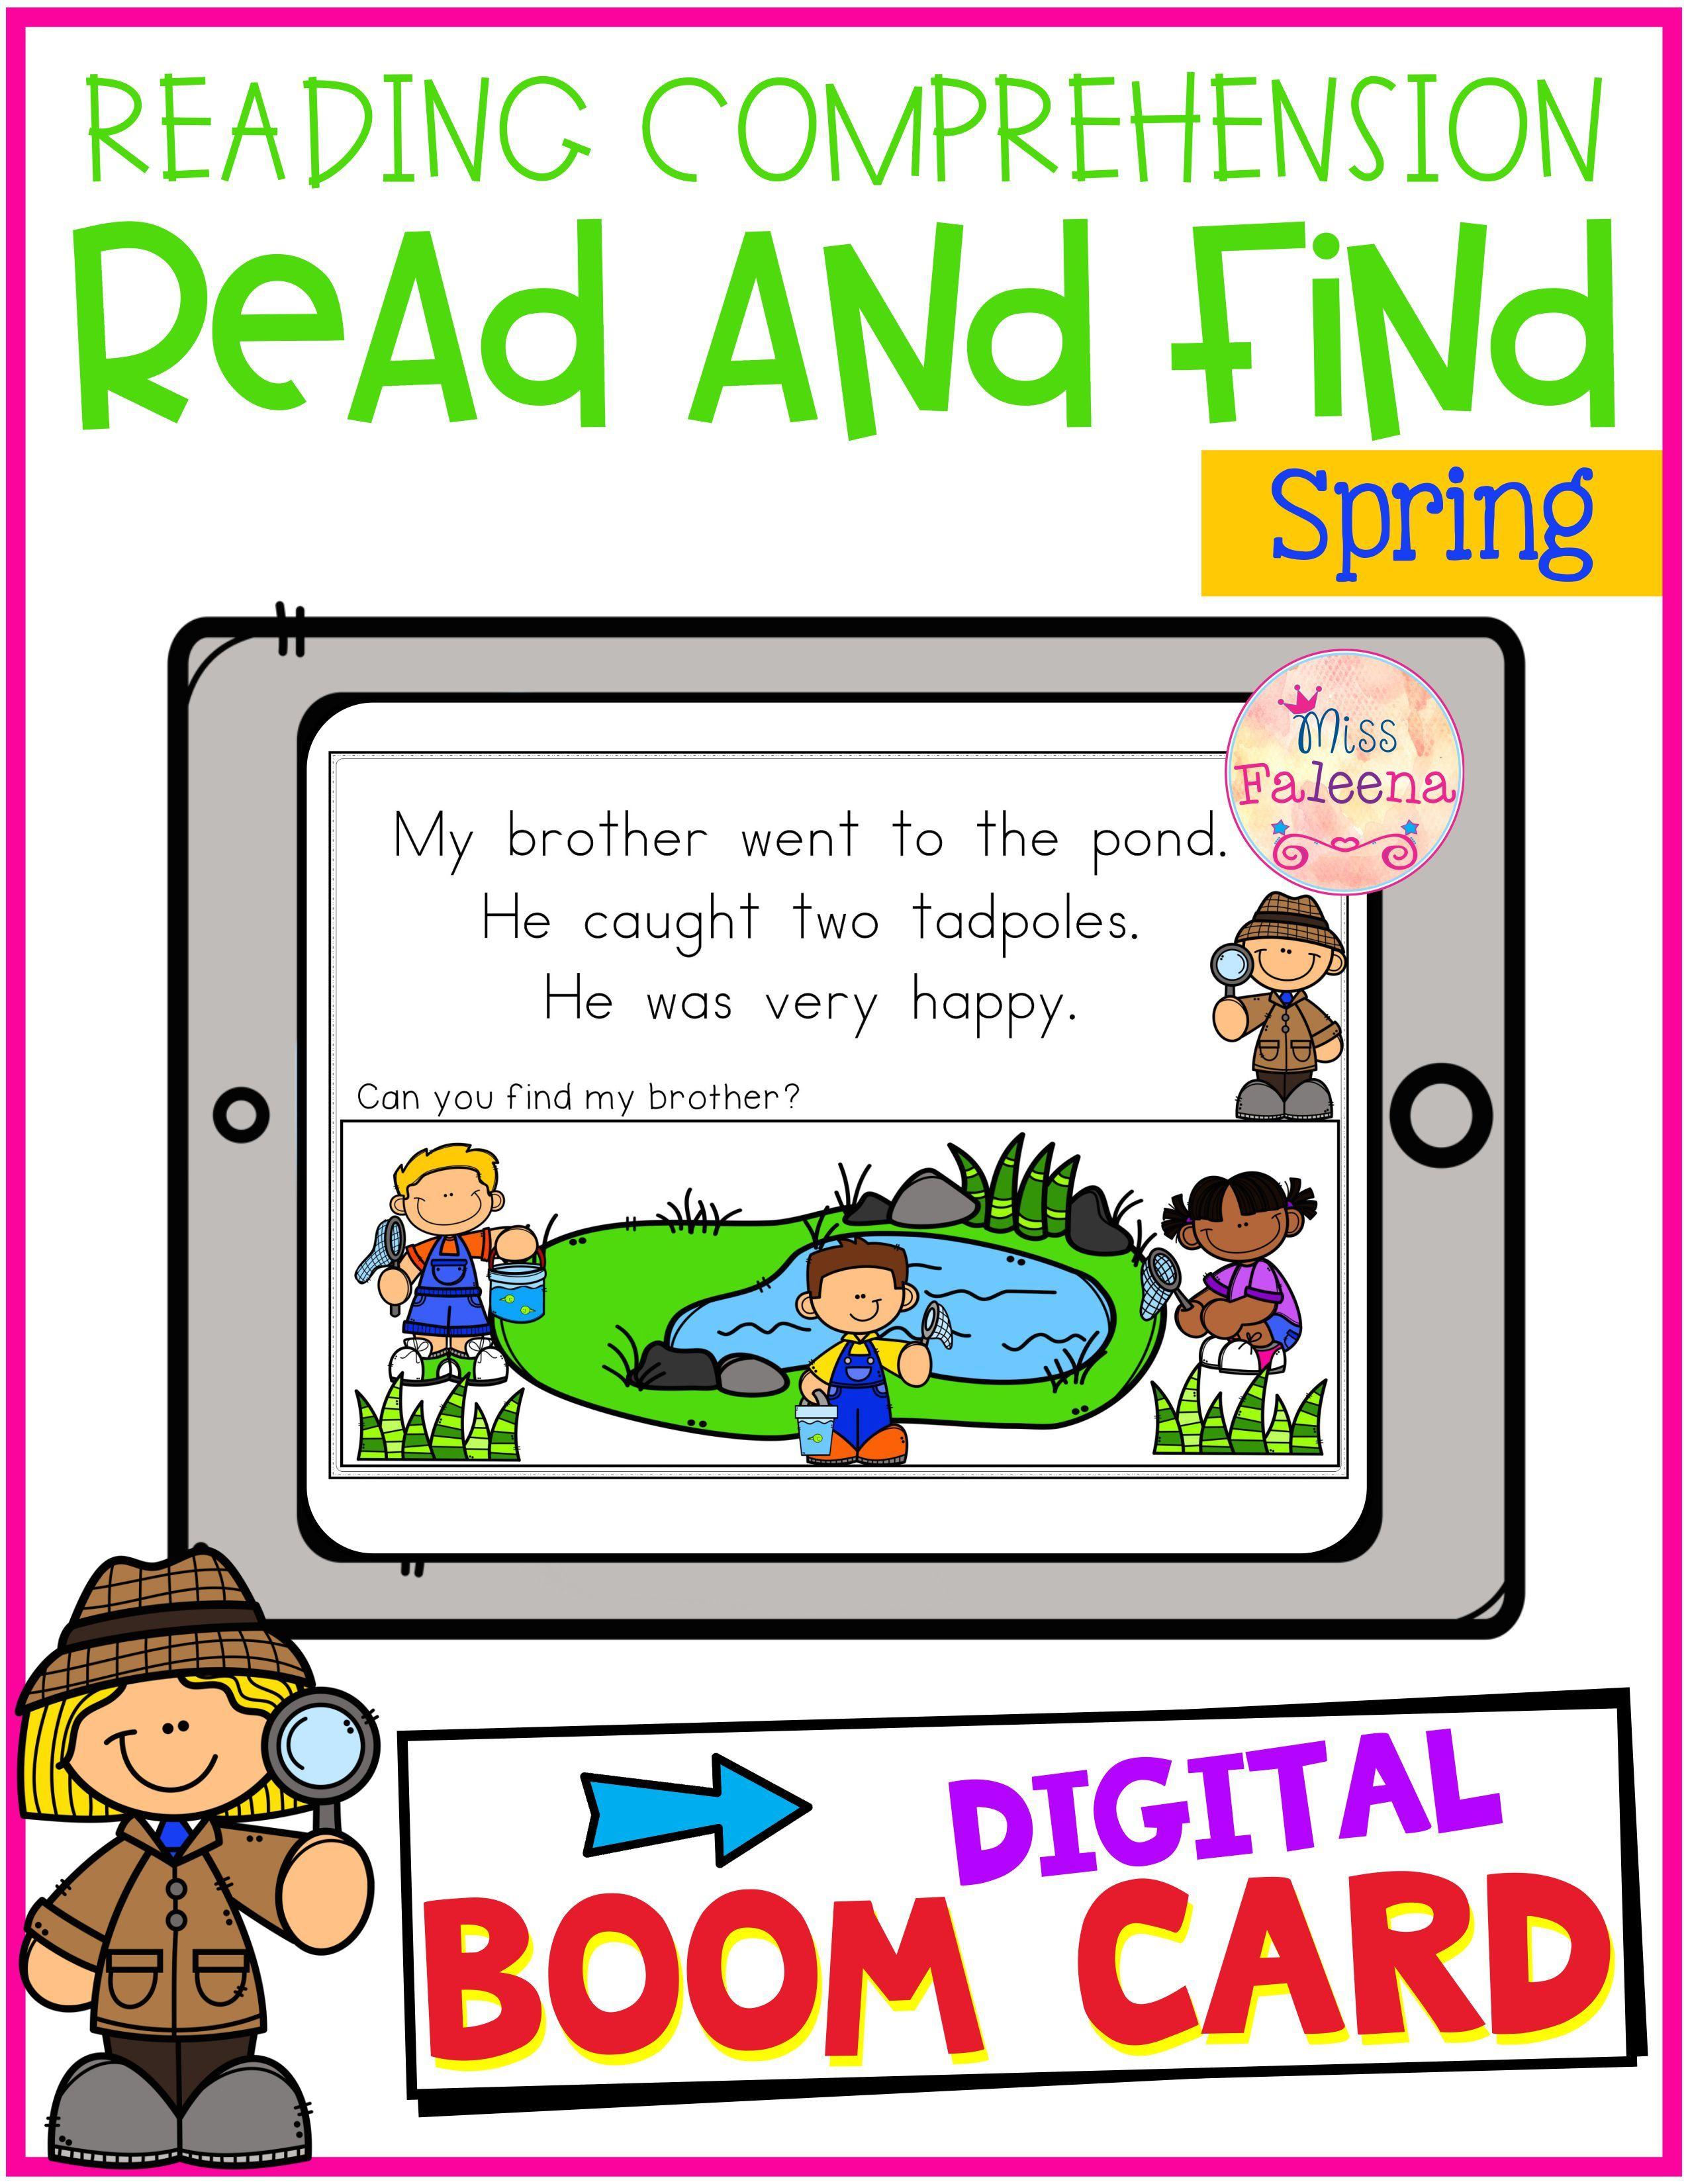 Reading Comprehension Boom Cards Reading Comprehension First Grade Reading Homeschool Programs First grade reading programs online